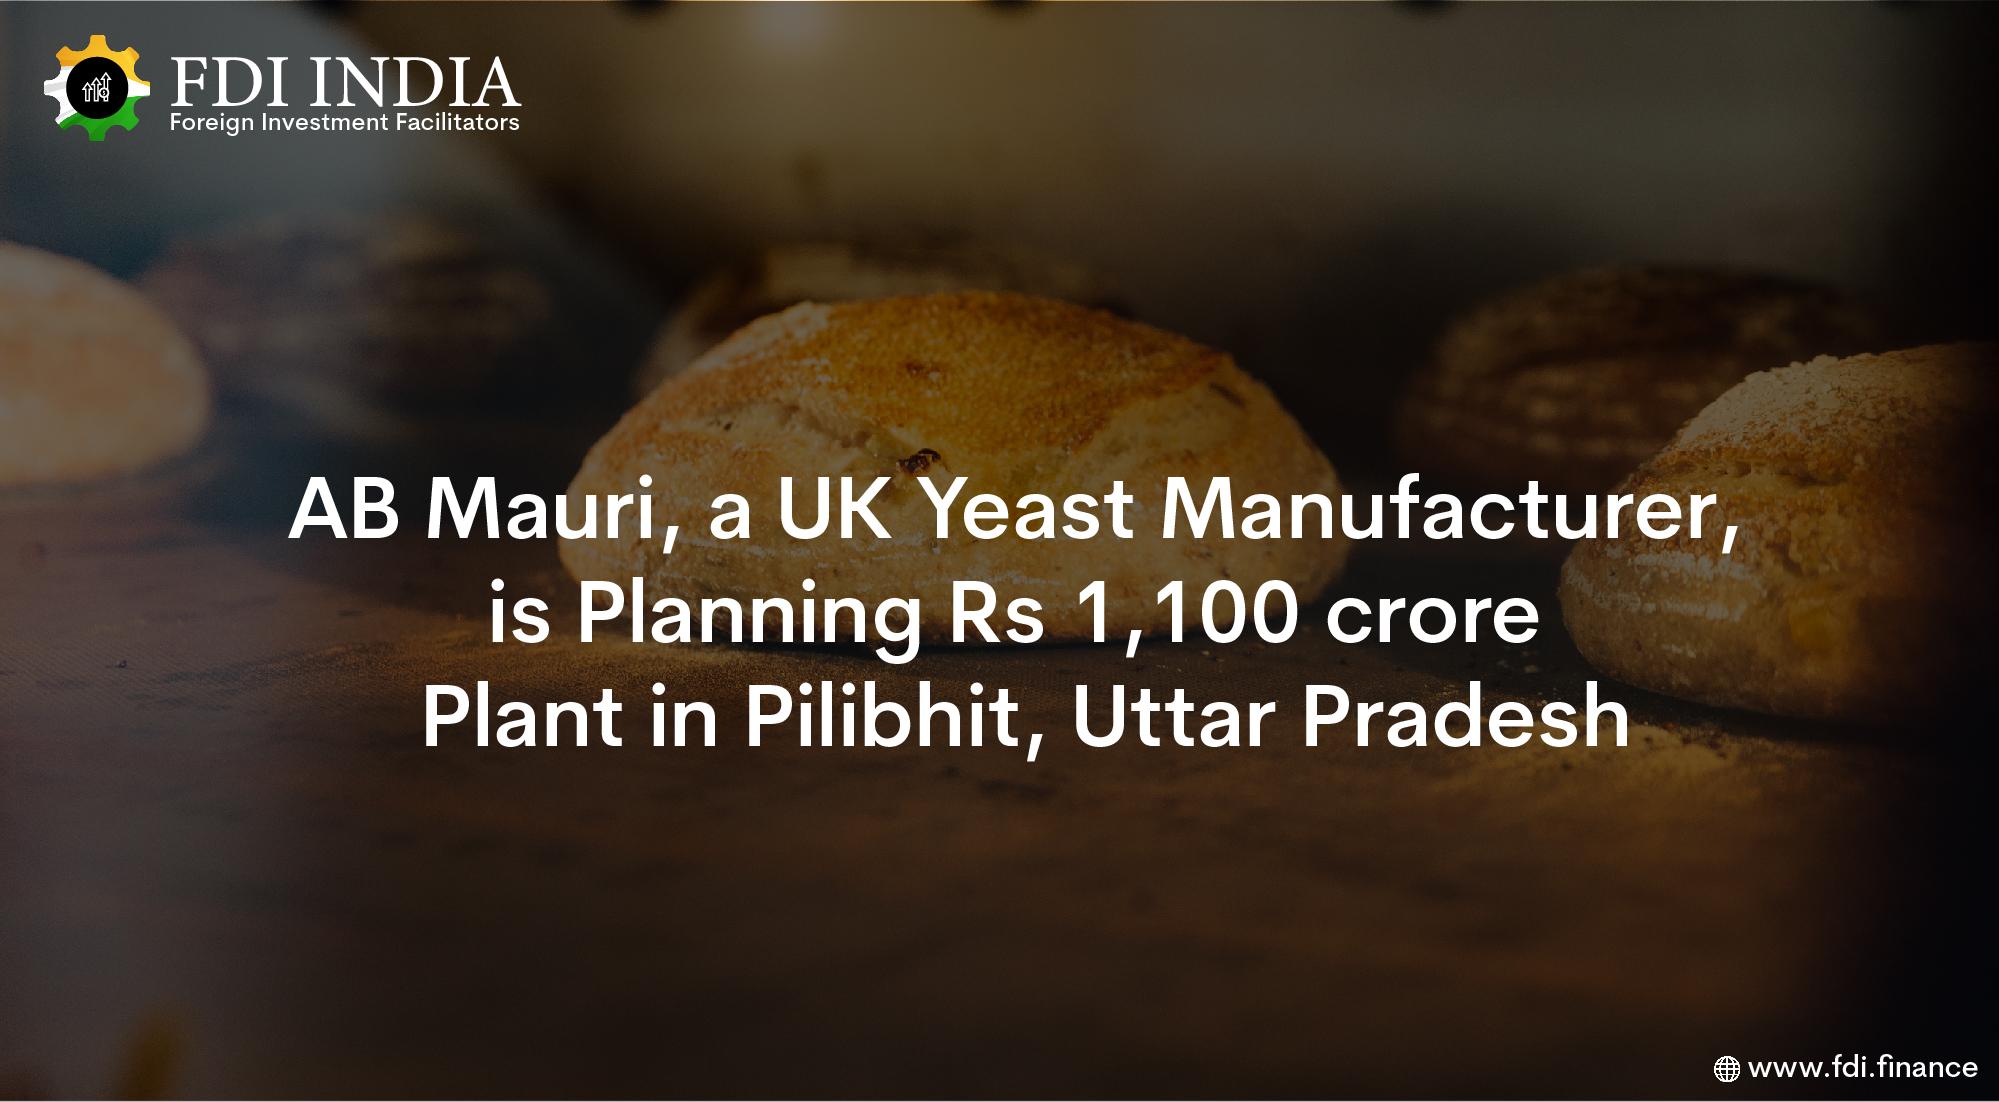 AB Mauri, a UK Yeast Manufacturer, Is Planning Rs 1,100 Crore Plant in Pilibhit, Uttar Pradesh